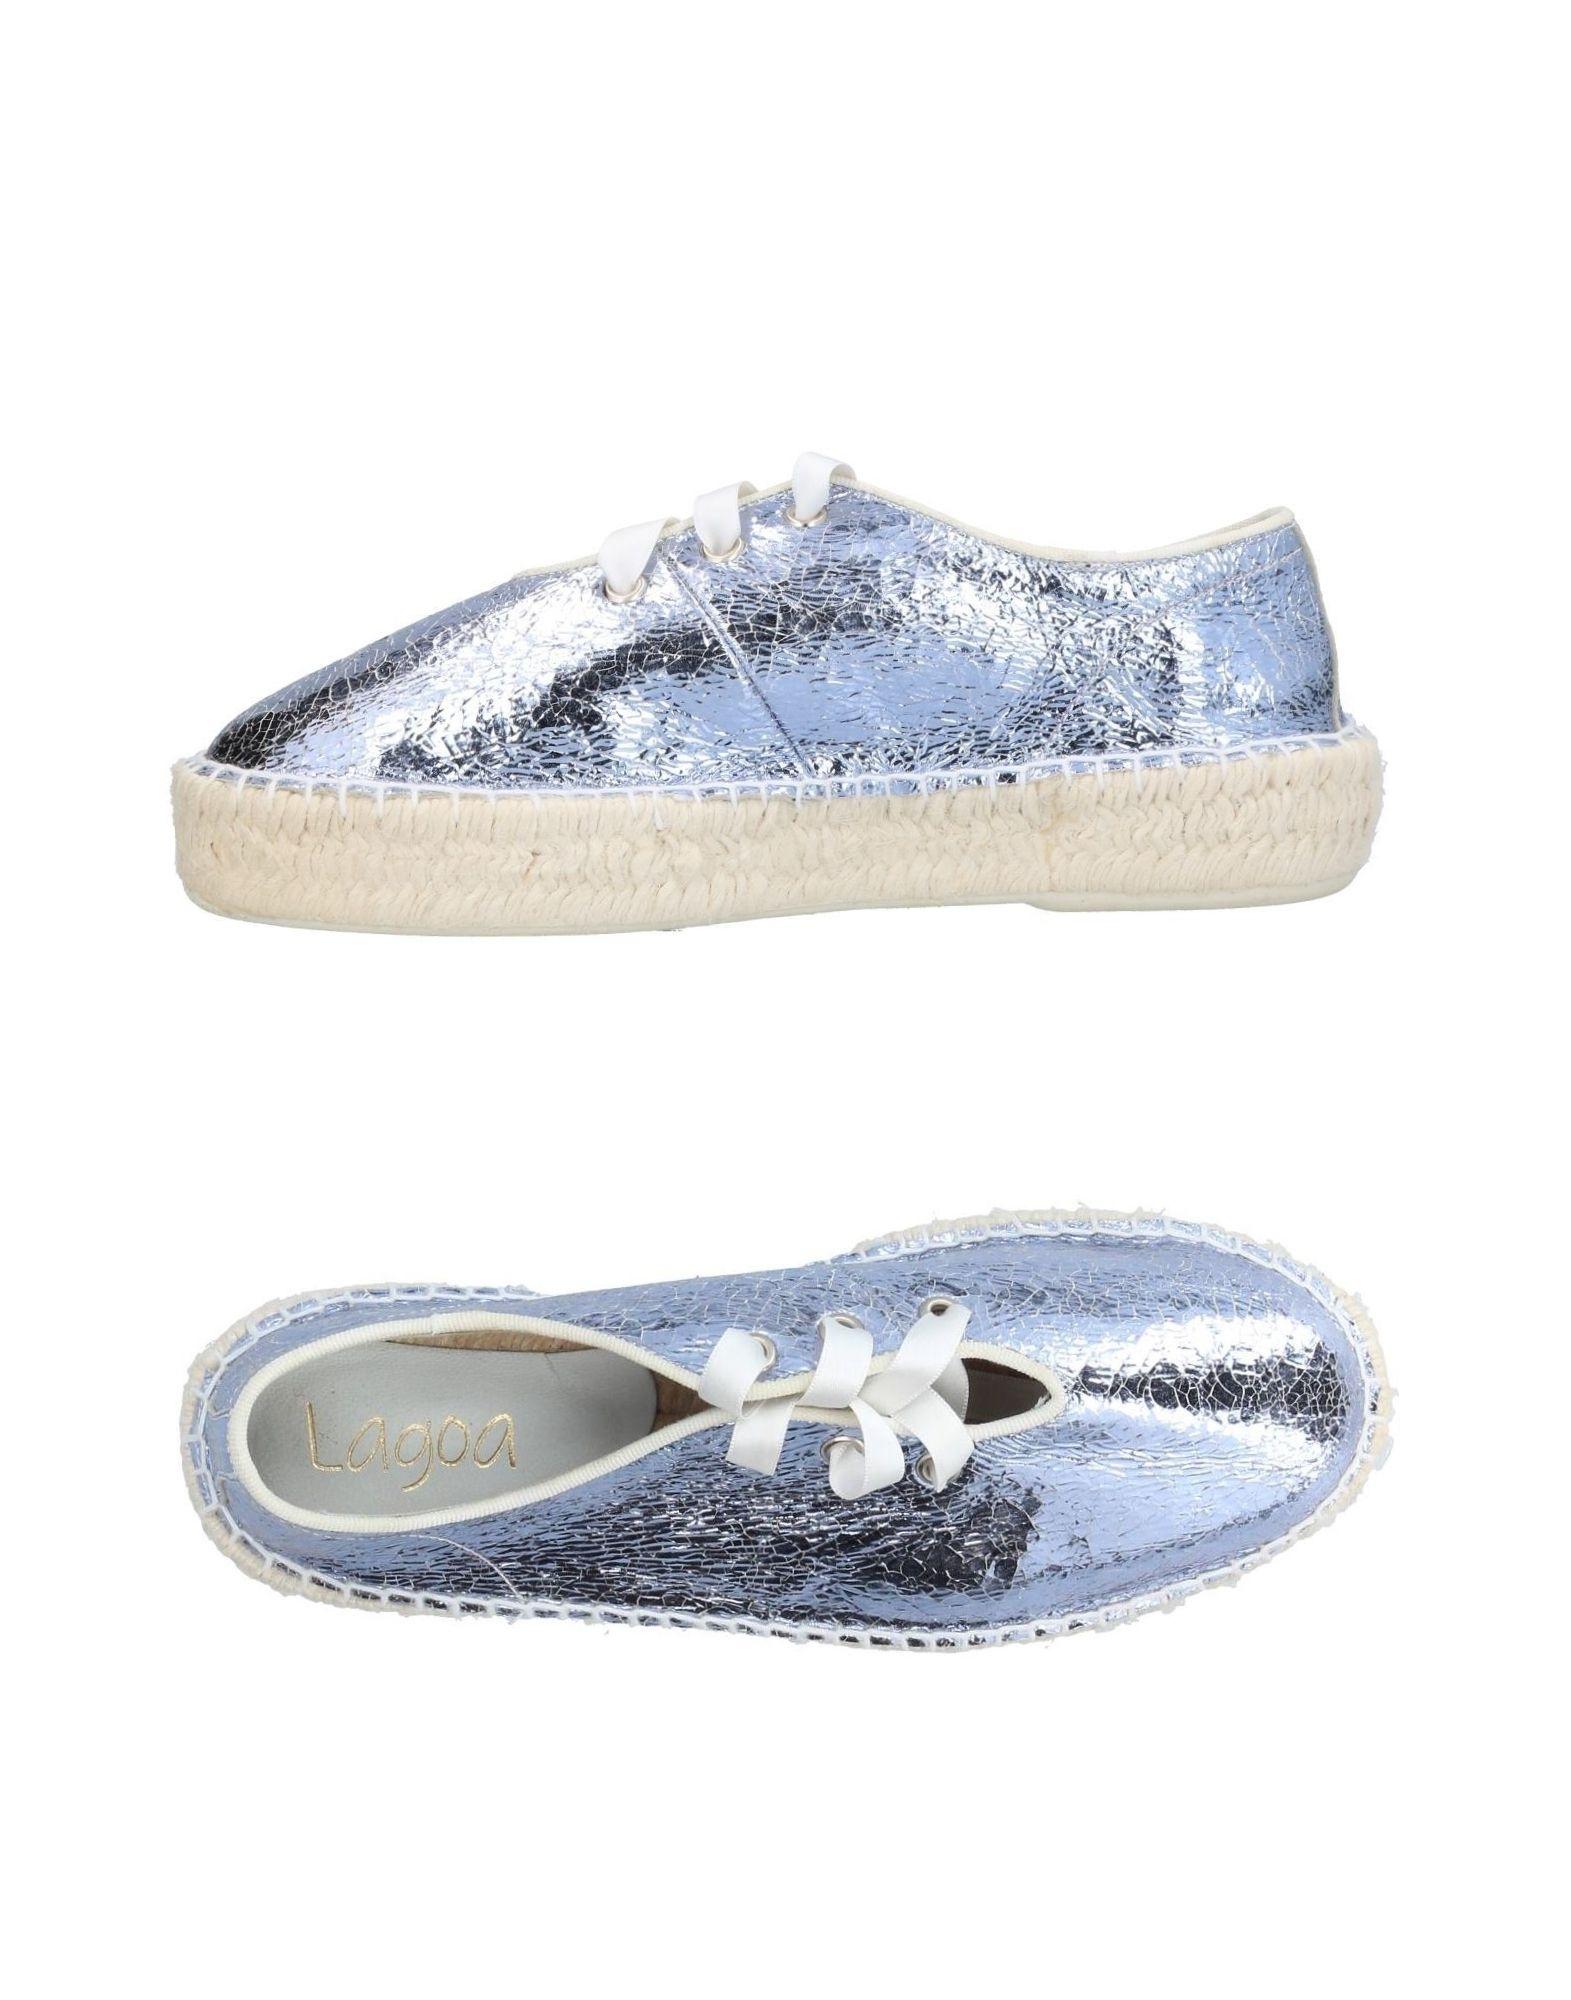 FOOTWEAR - Lace-up shoes Lagoa bTl9sWLjs